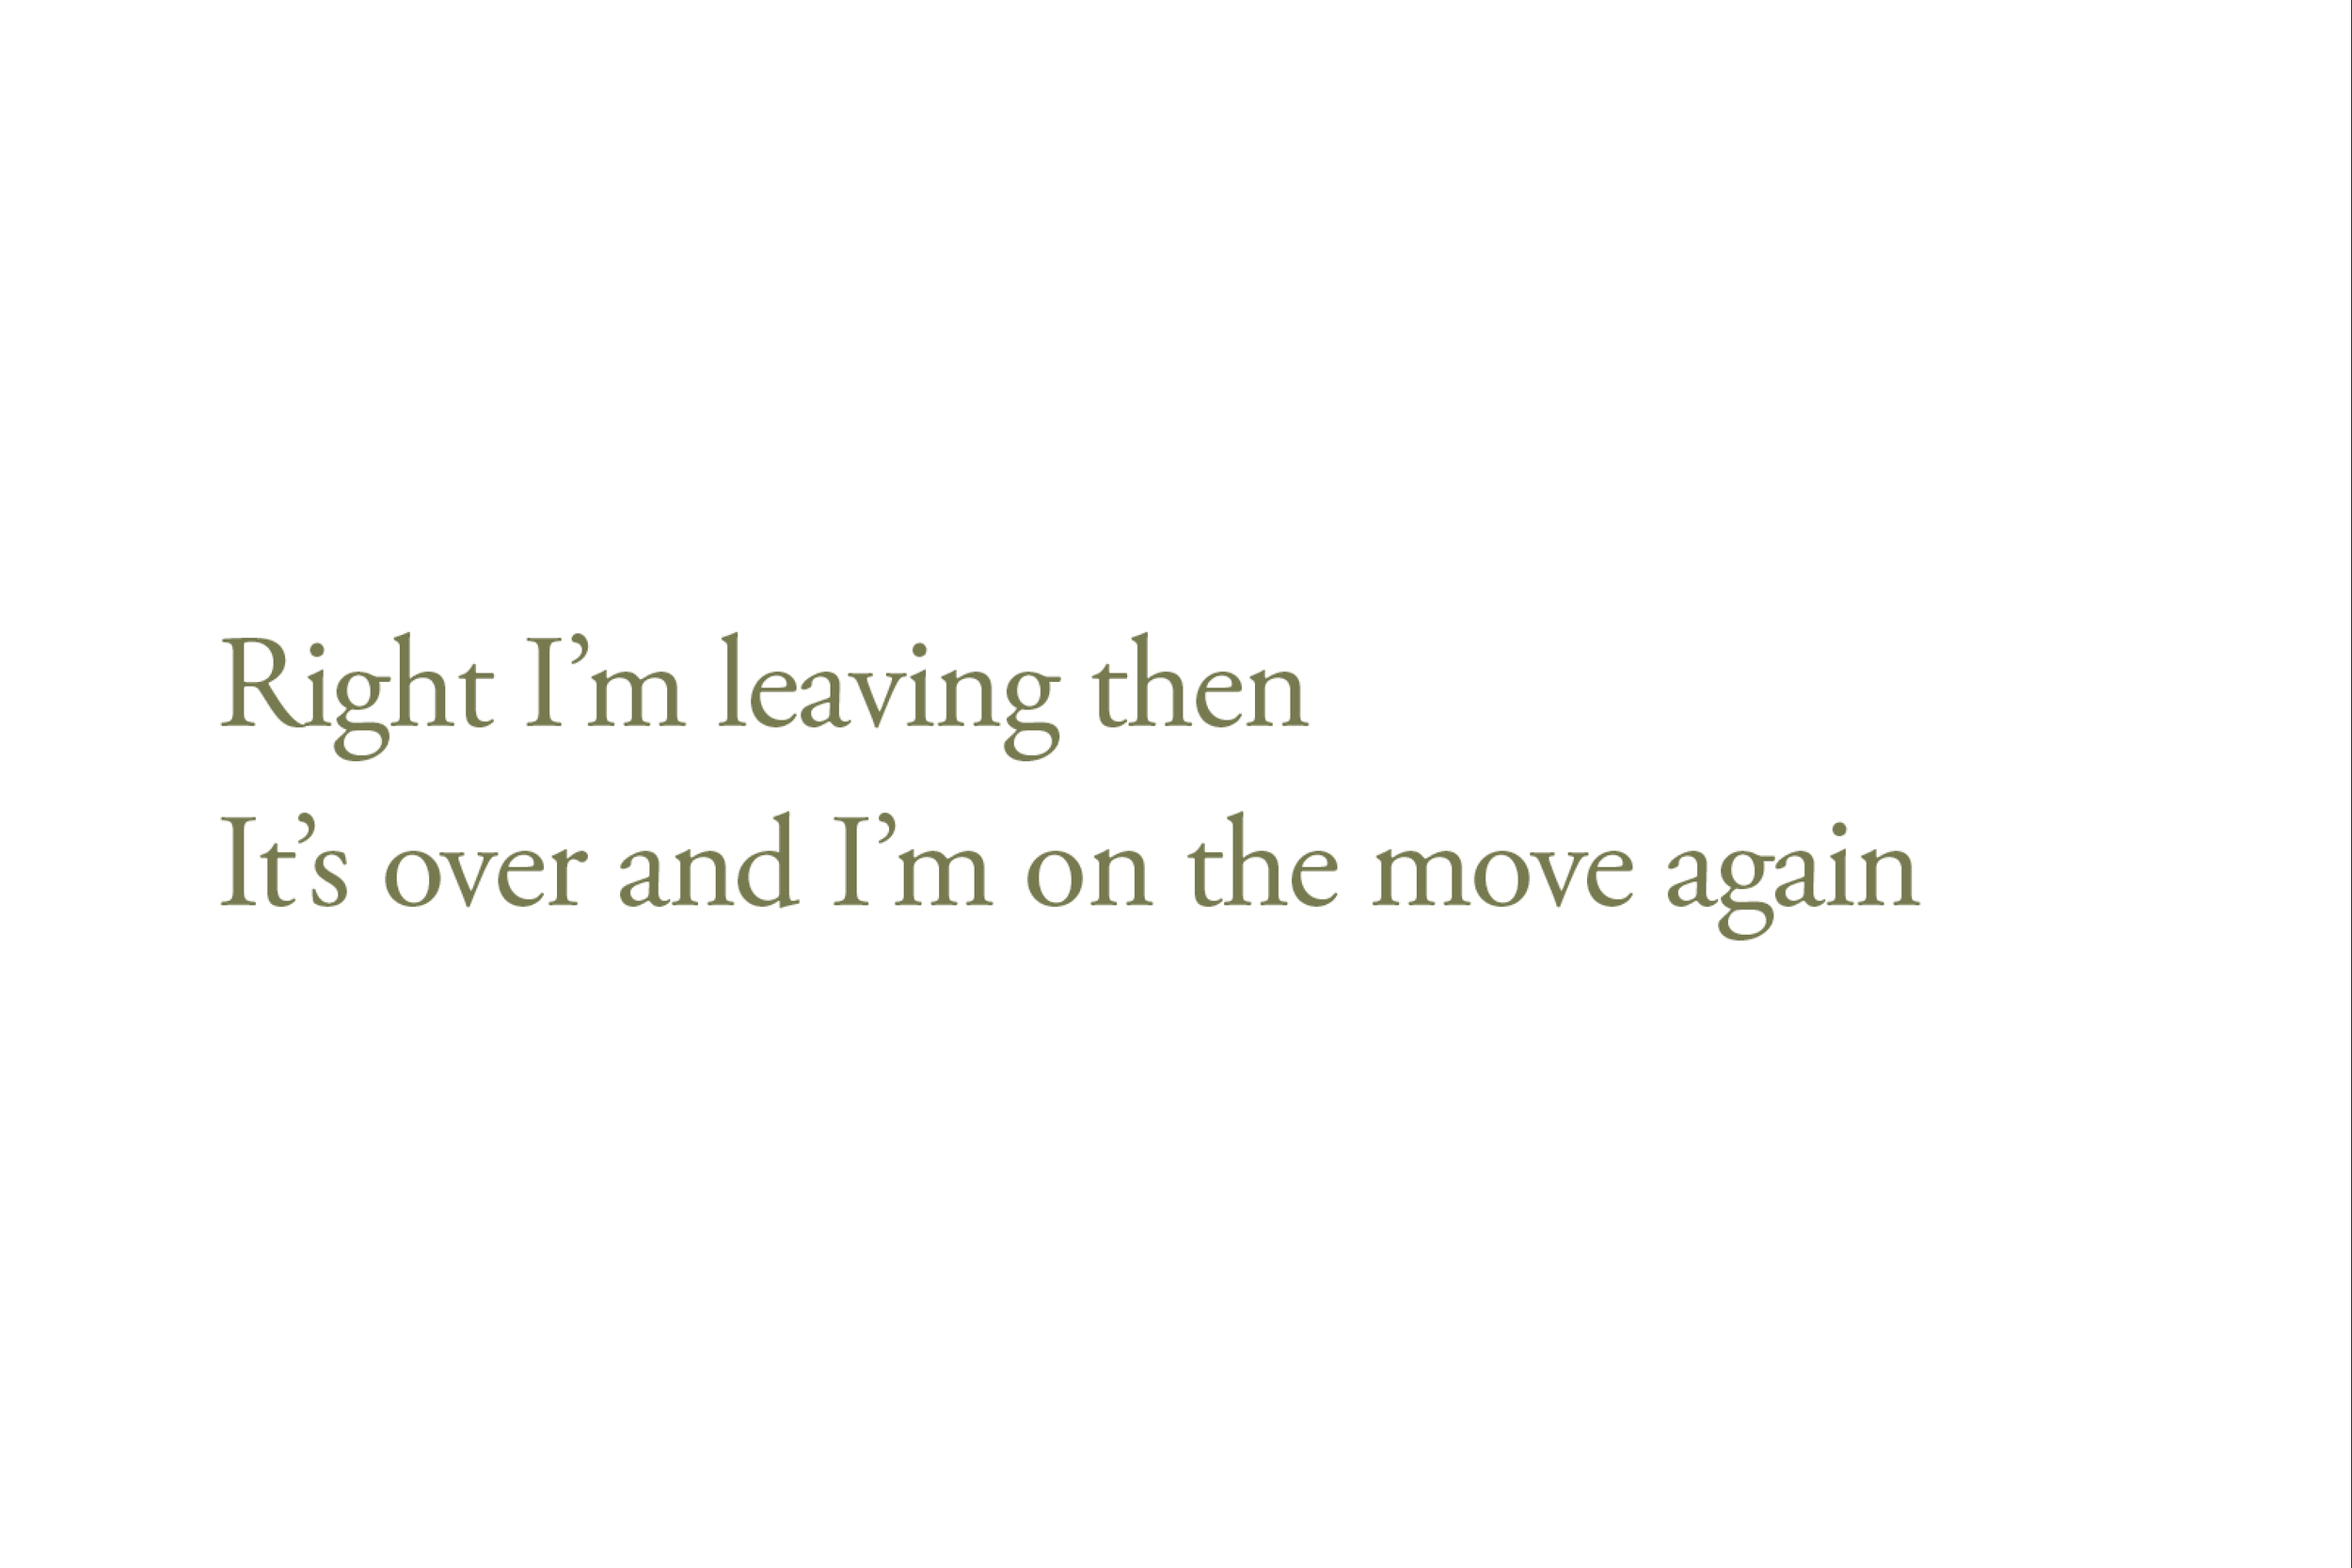 Right I'm leaving.jpg